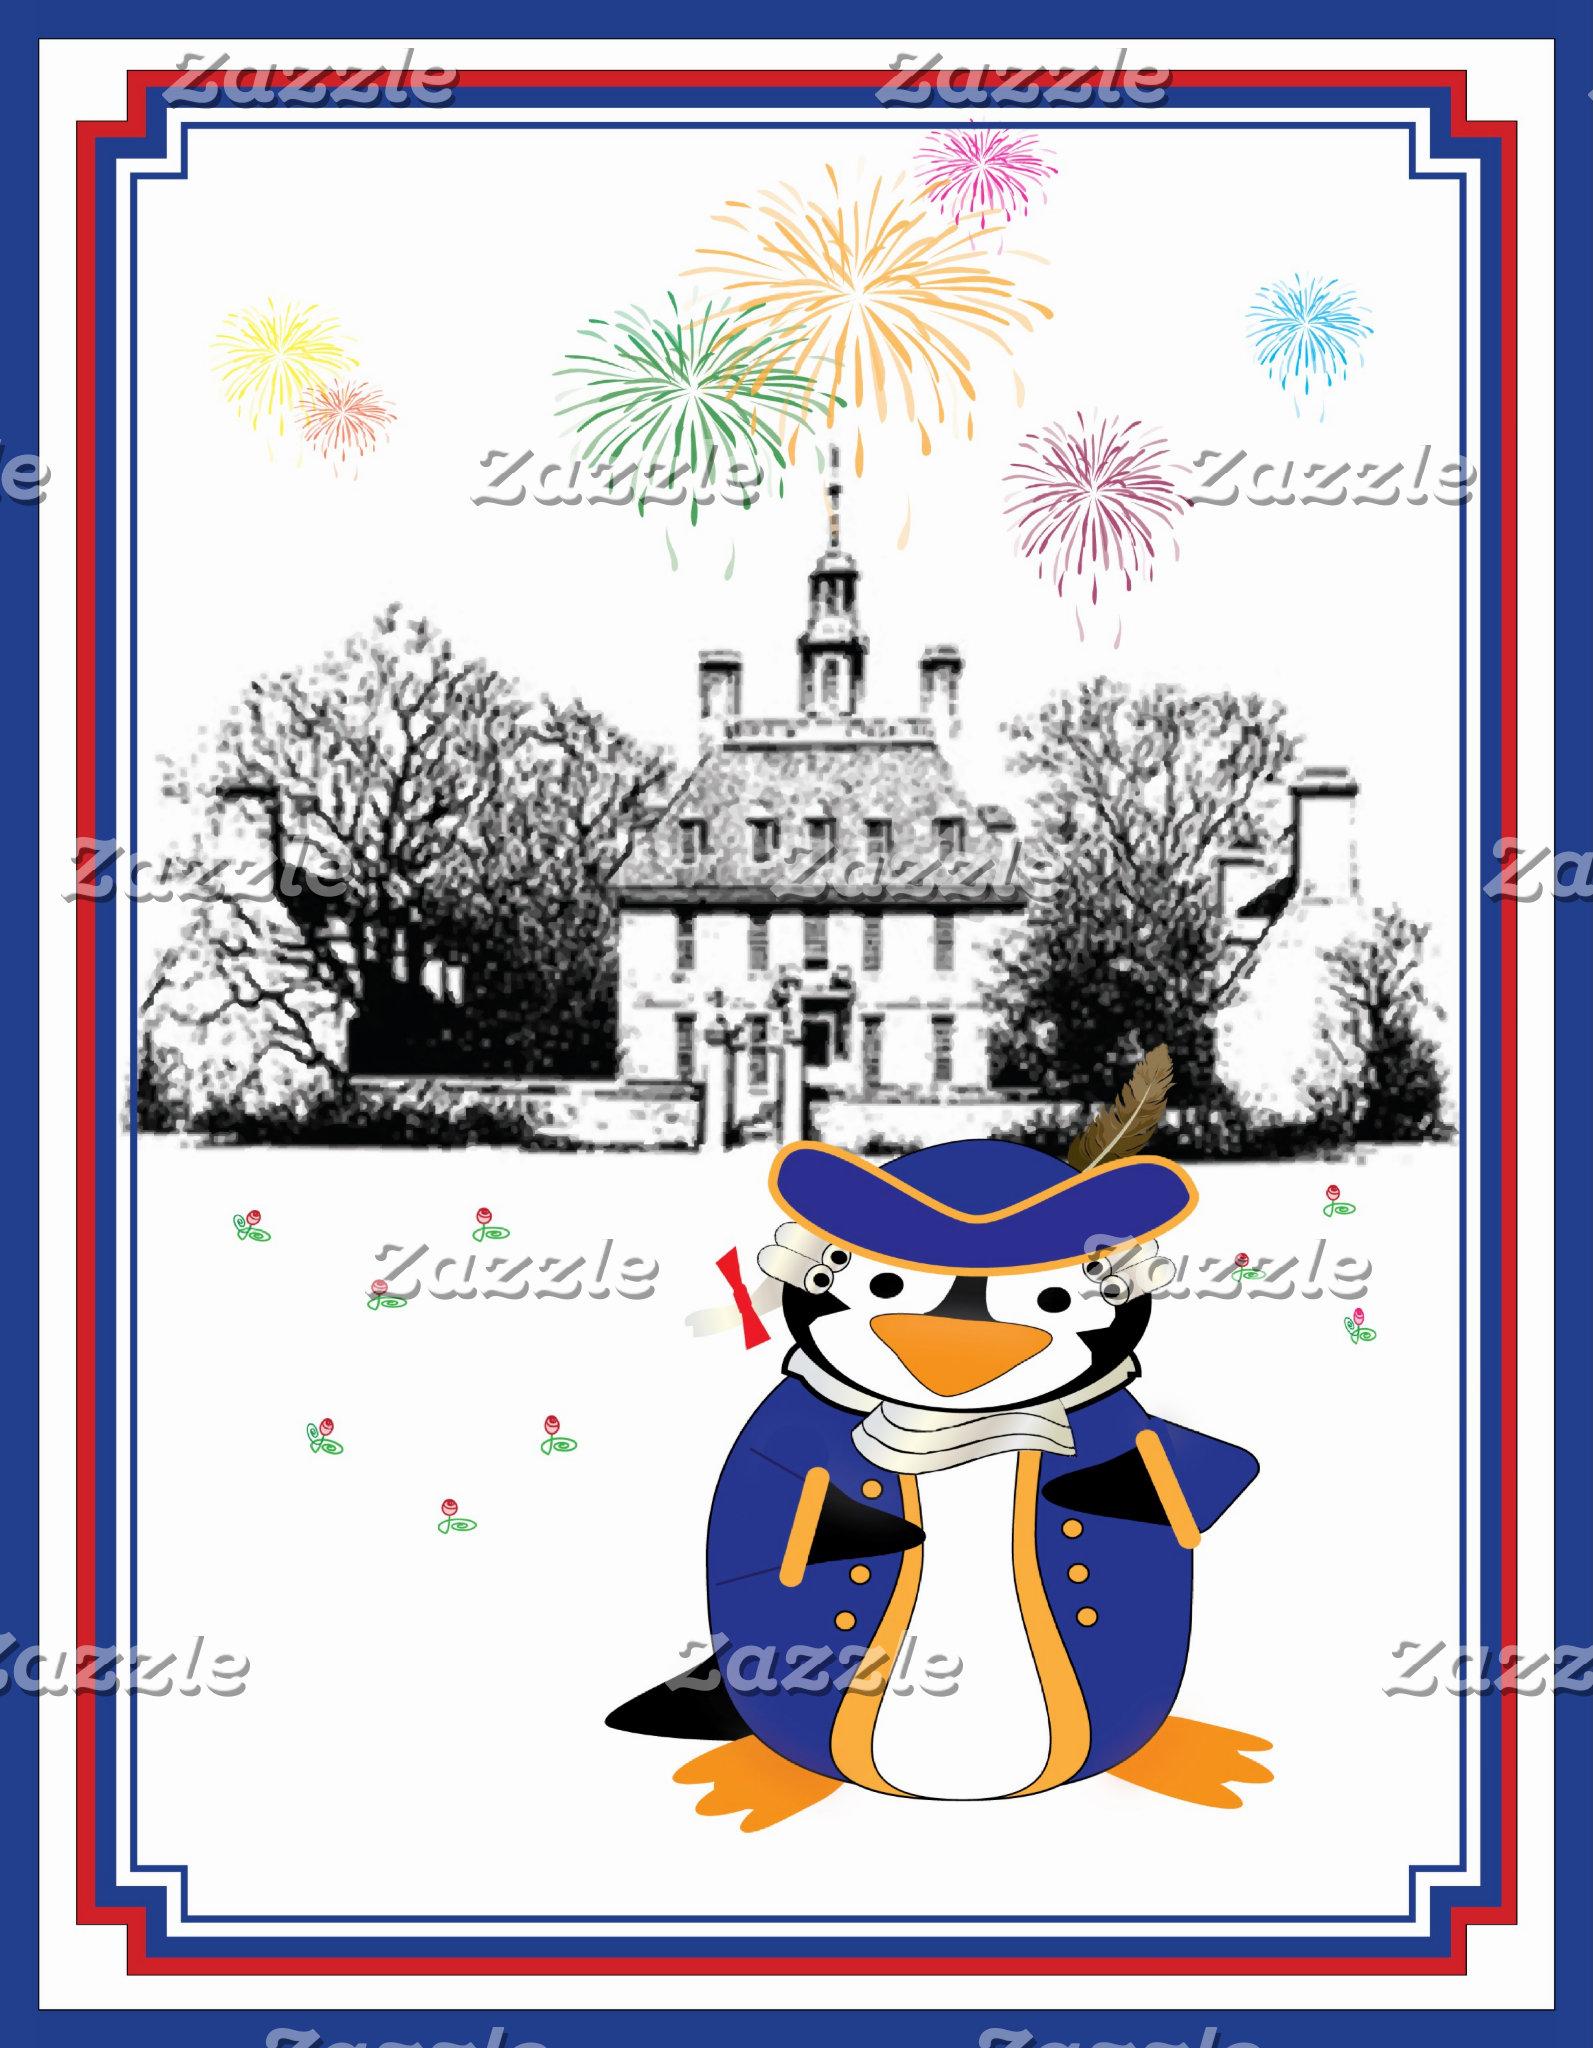 Yankee Doodle Penguin